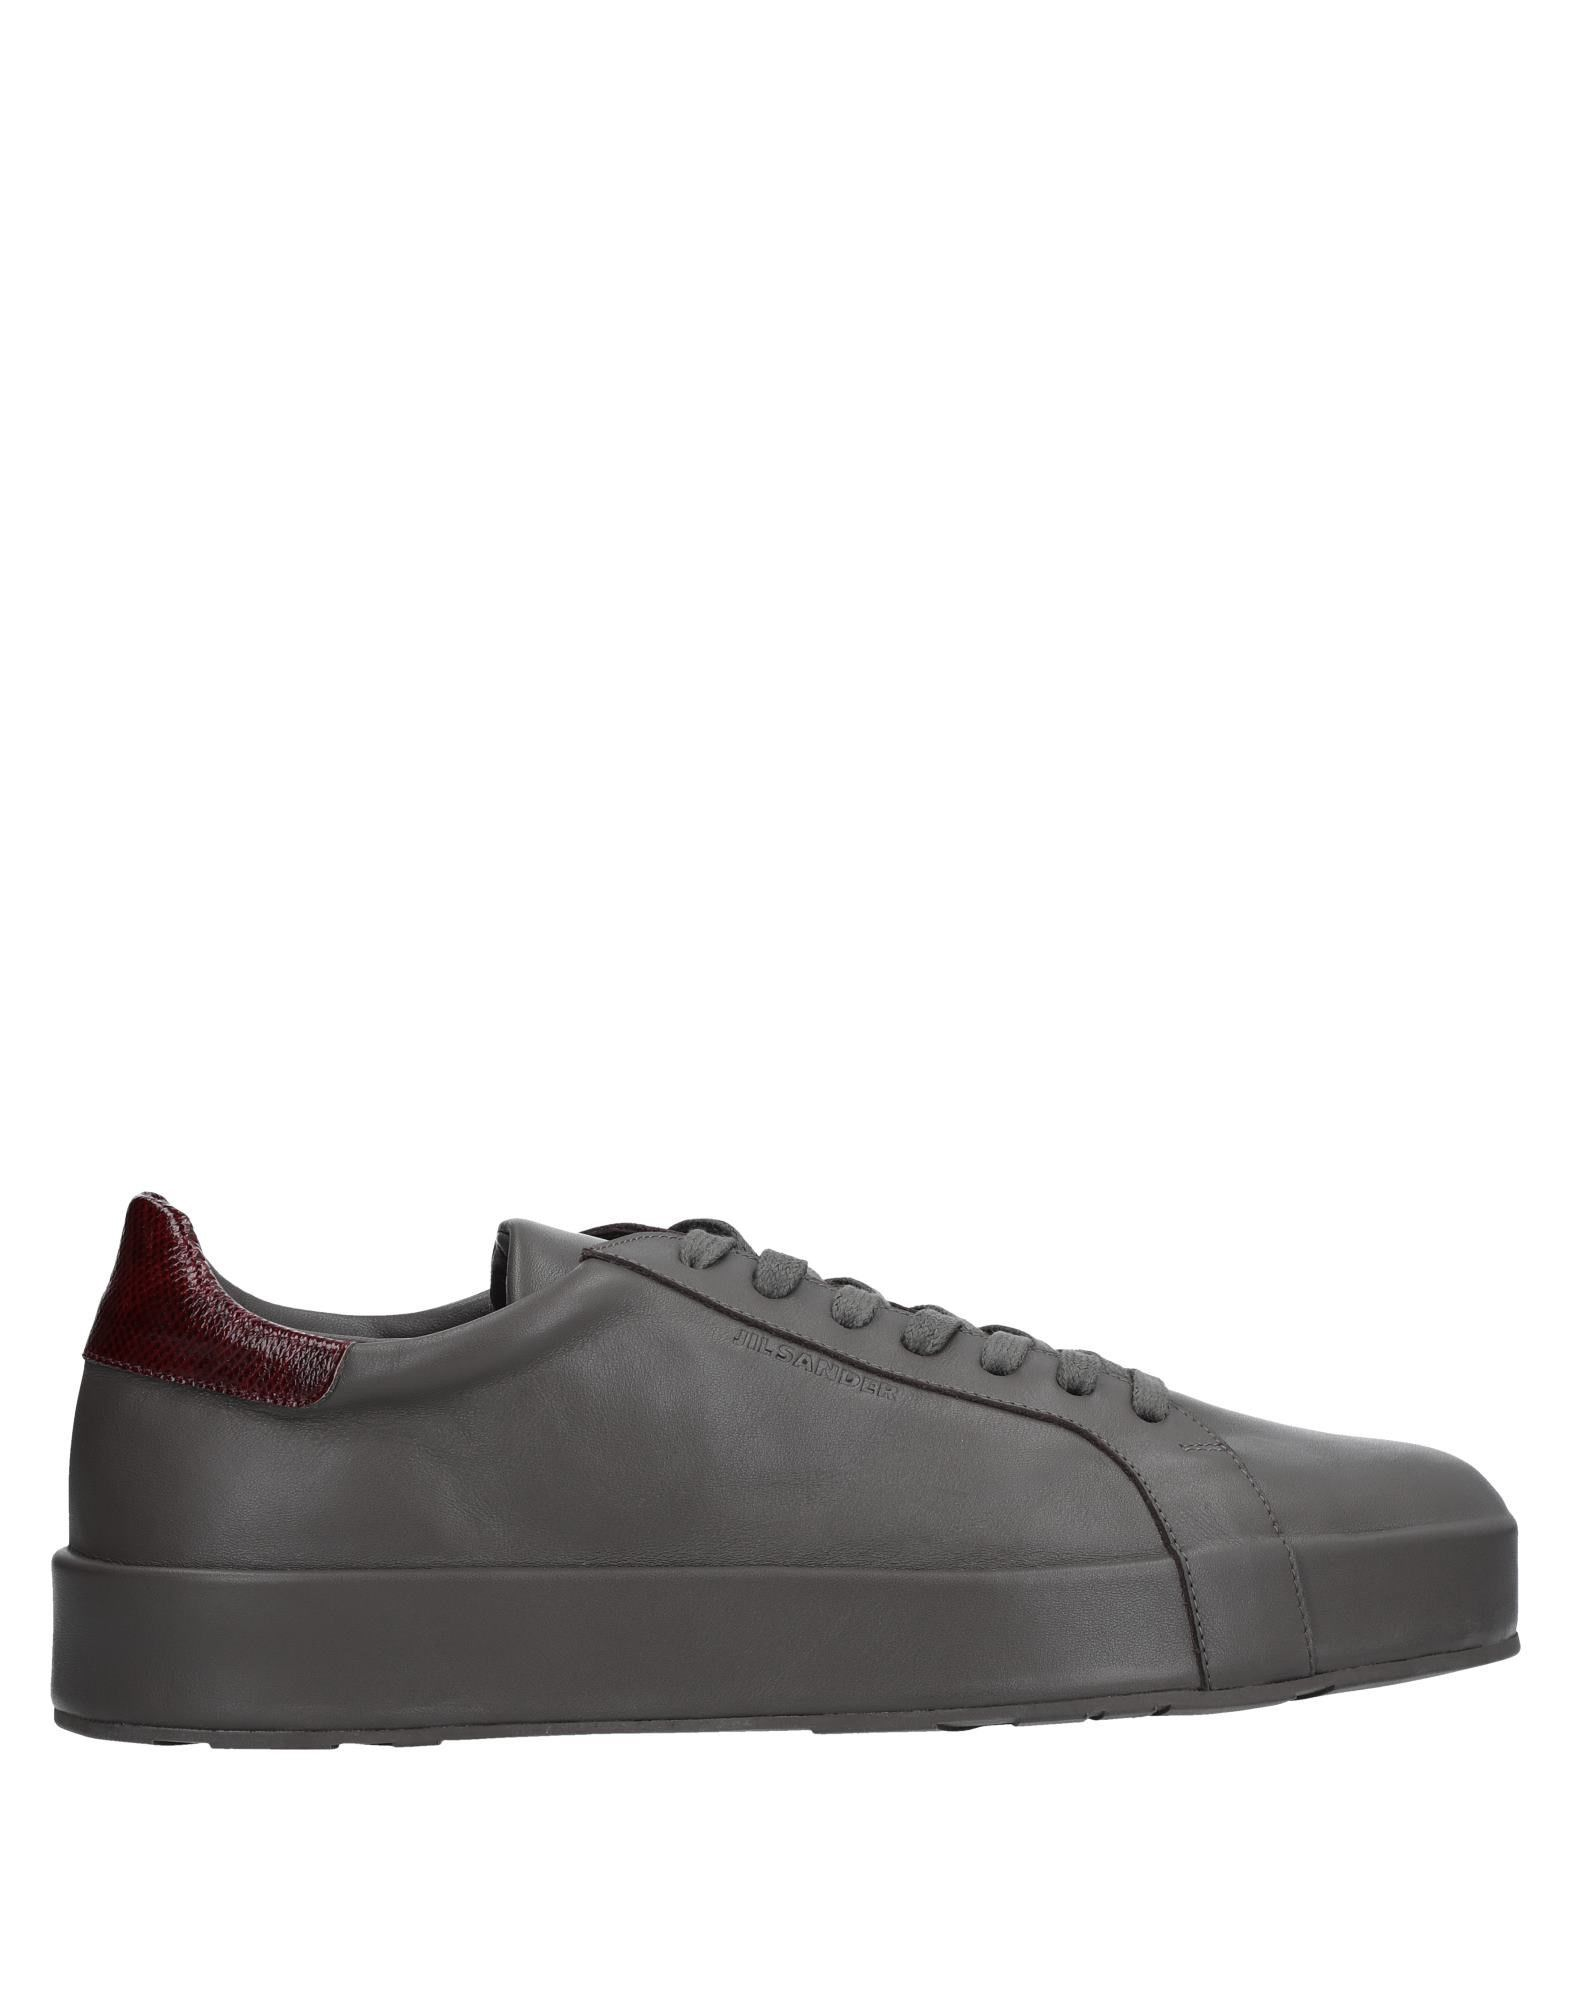 Jil Sander Lead Leather Sneakers